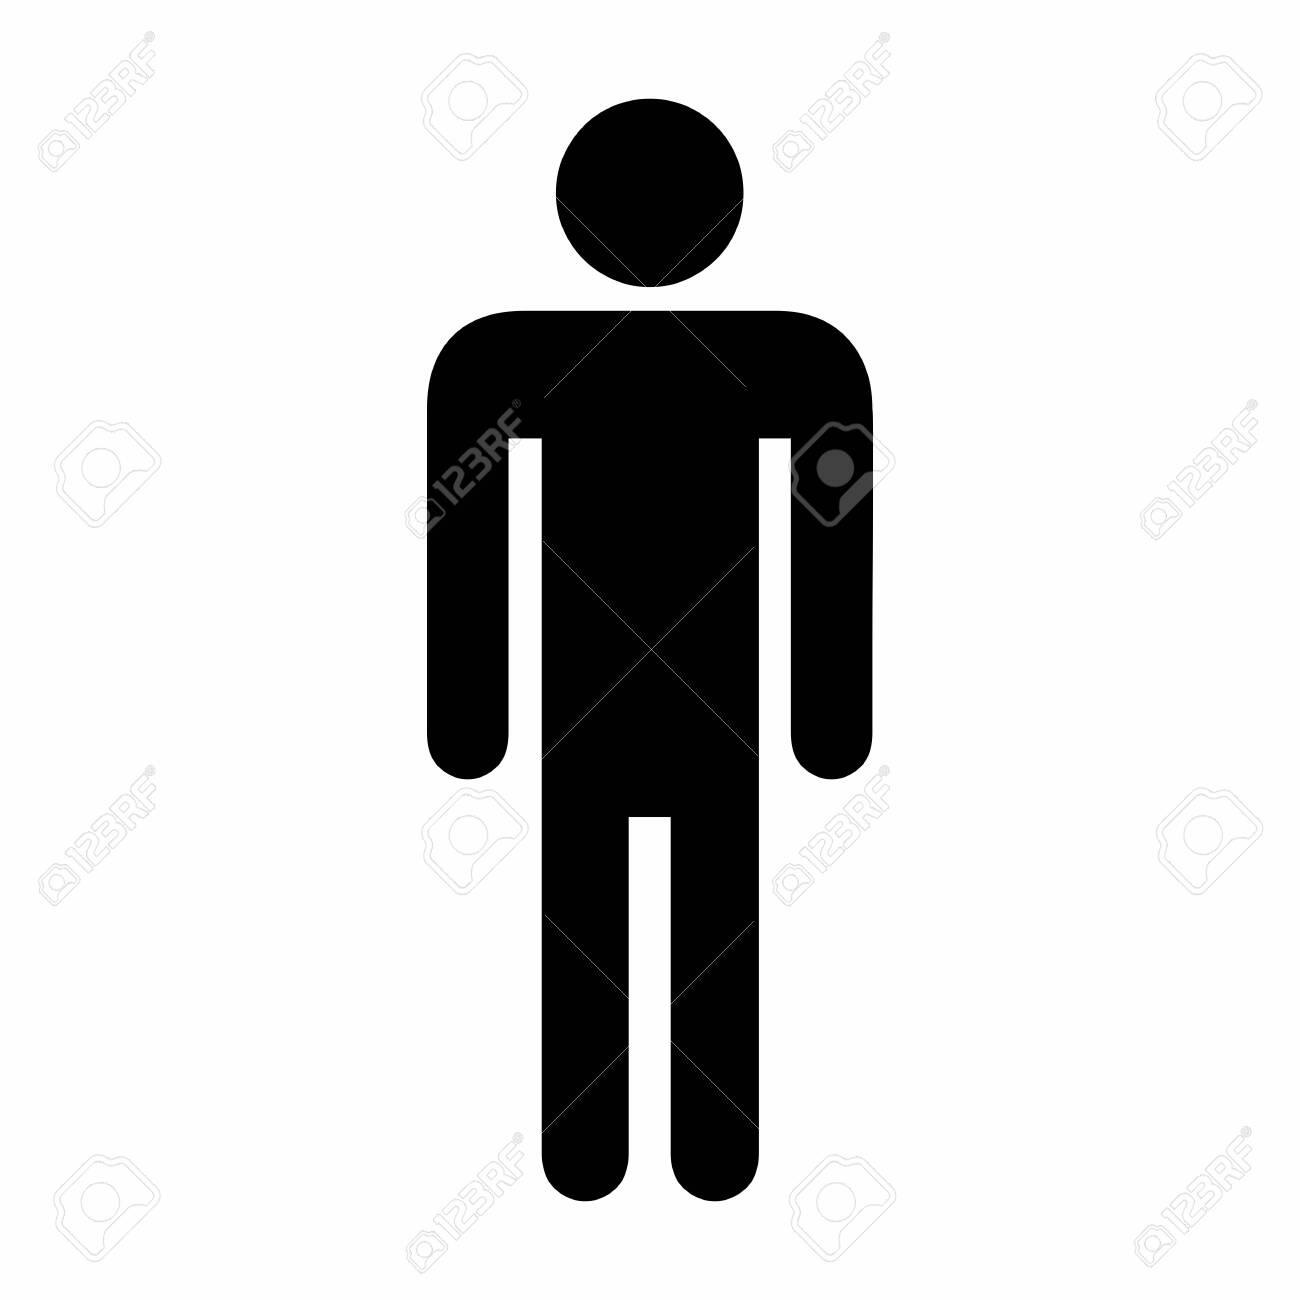 Illustration of Men icon on white background - 131445917